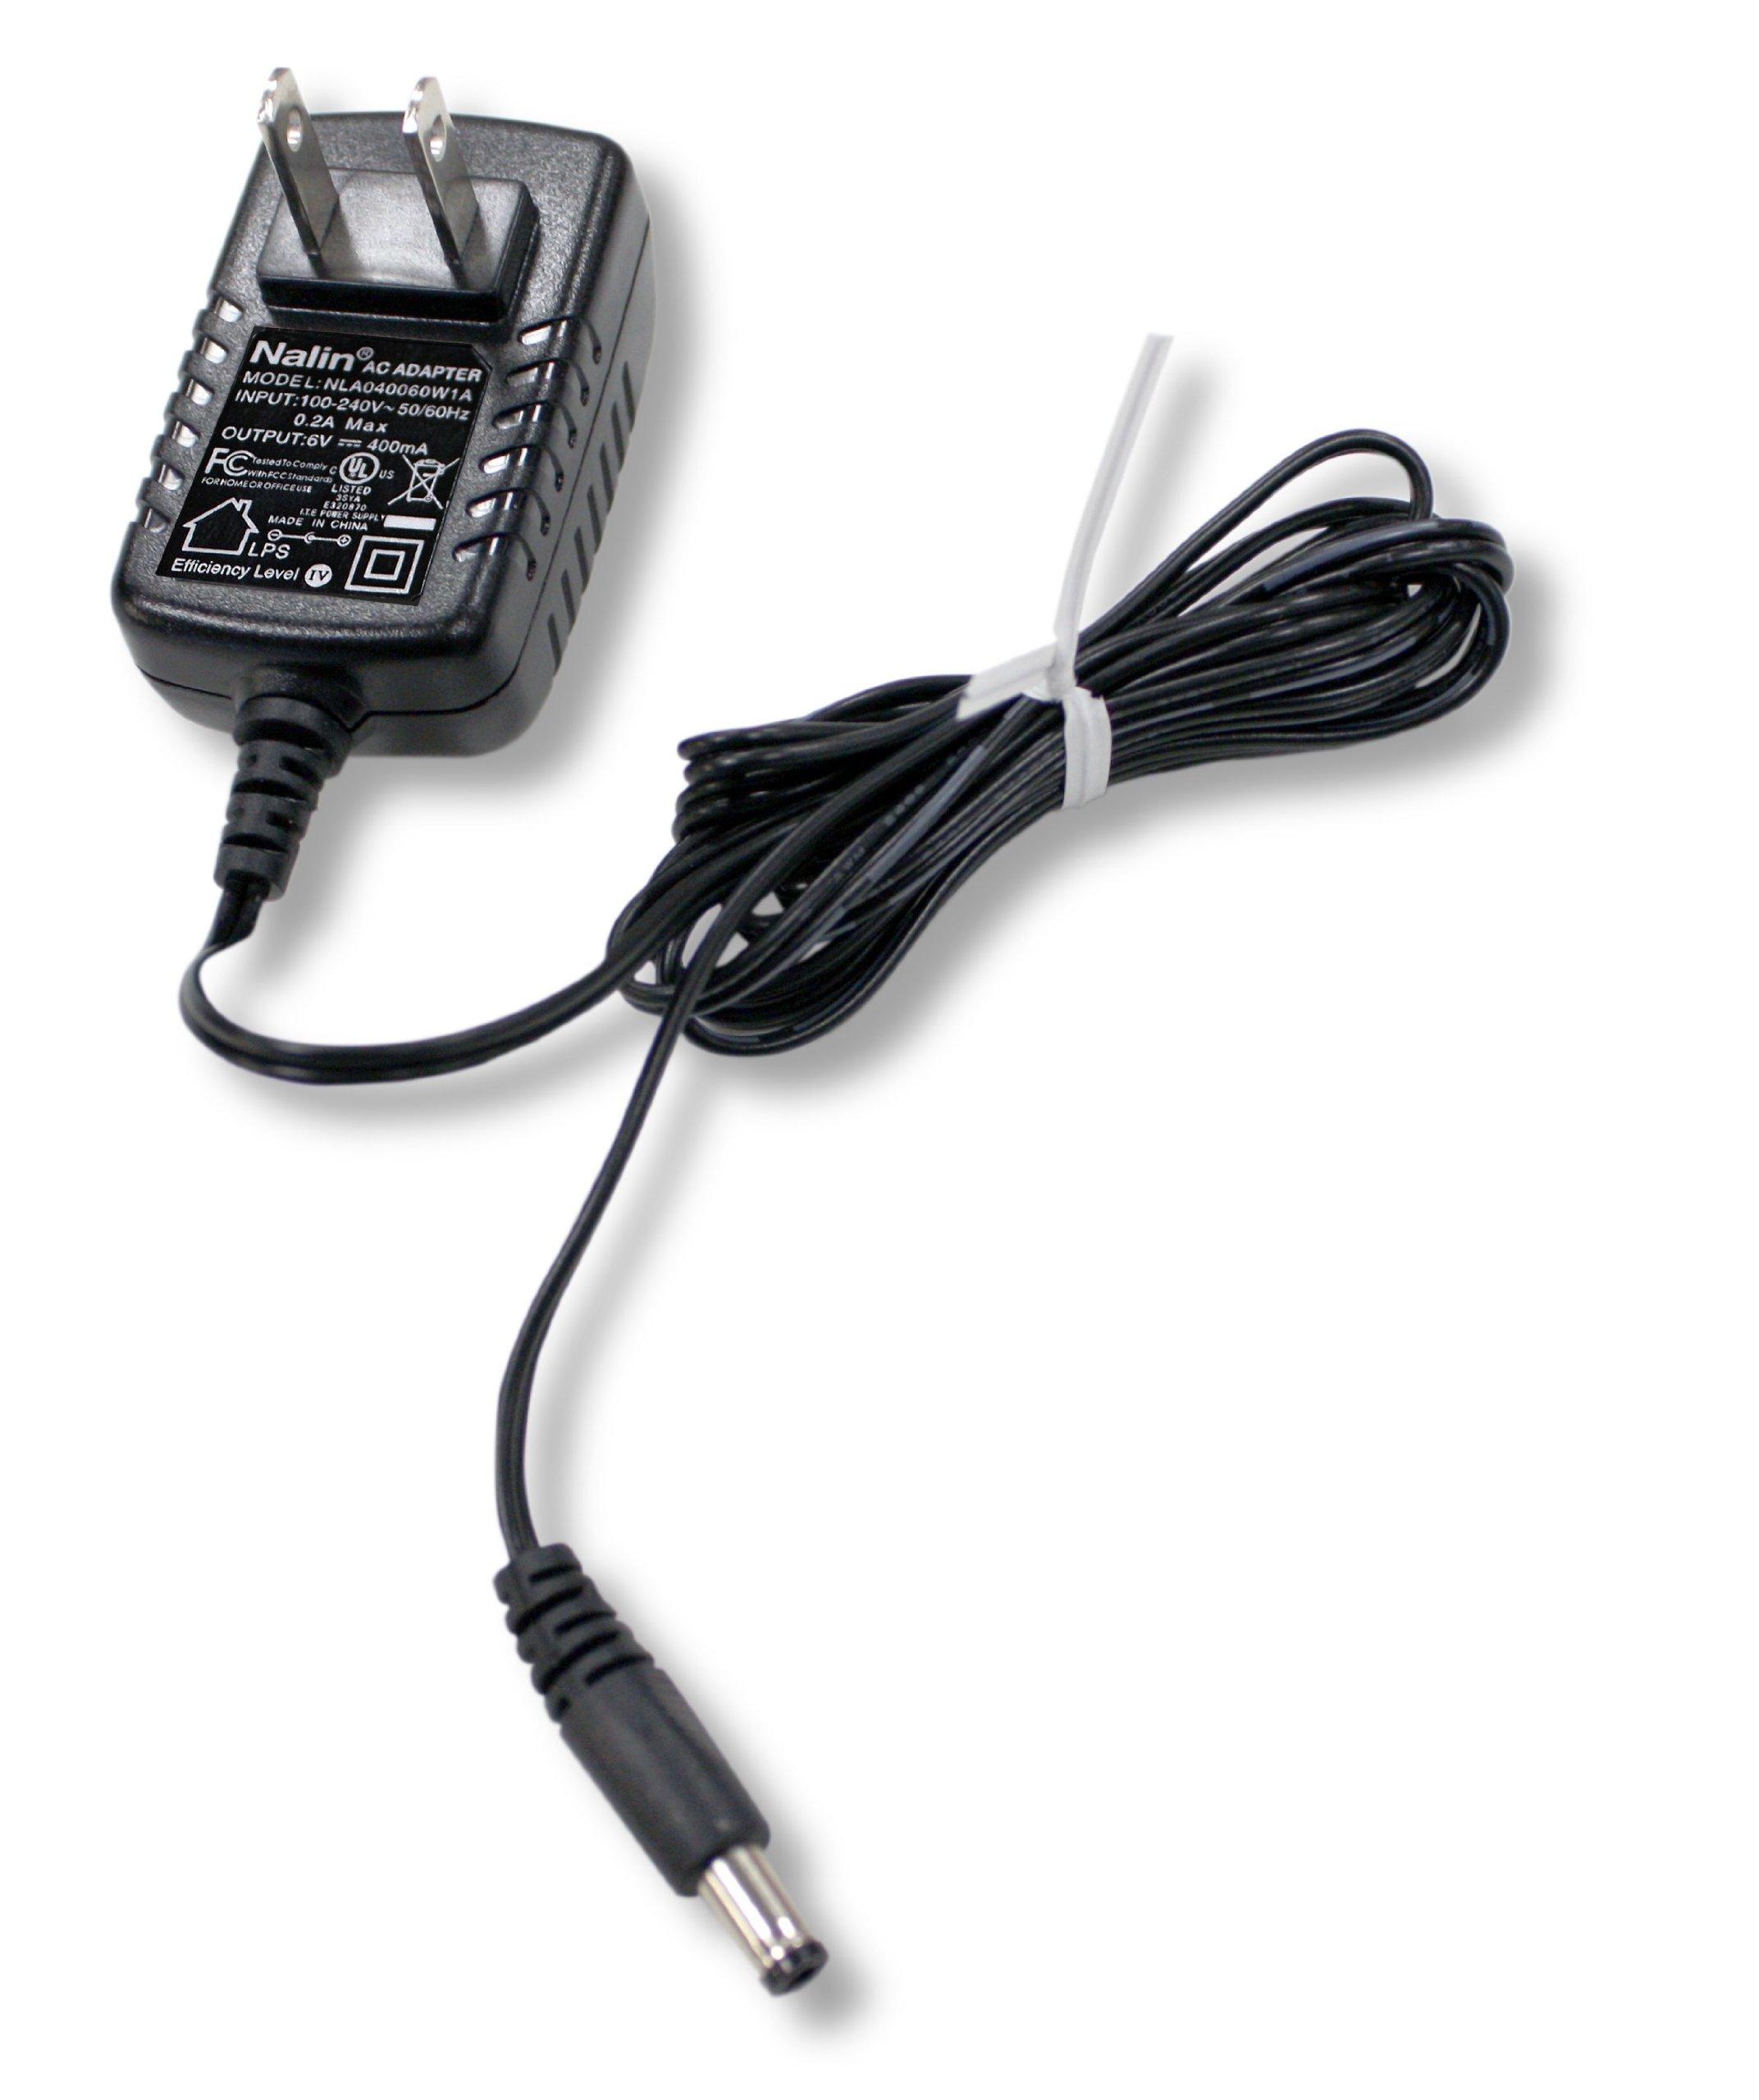 Cooper-Atkins 9374 AC Adapter for TFS4 Multi-Station Digital Timer